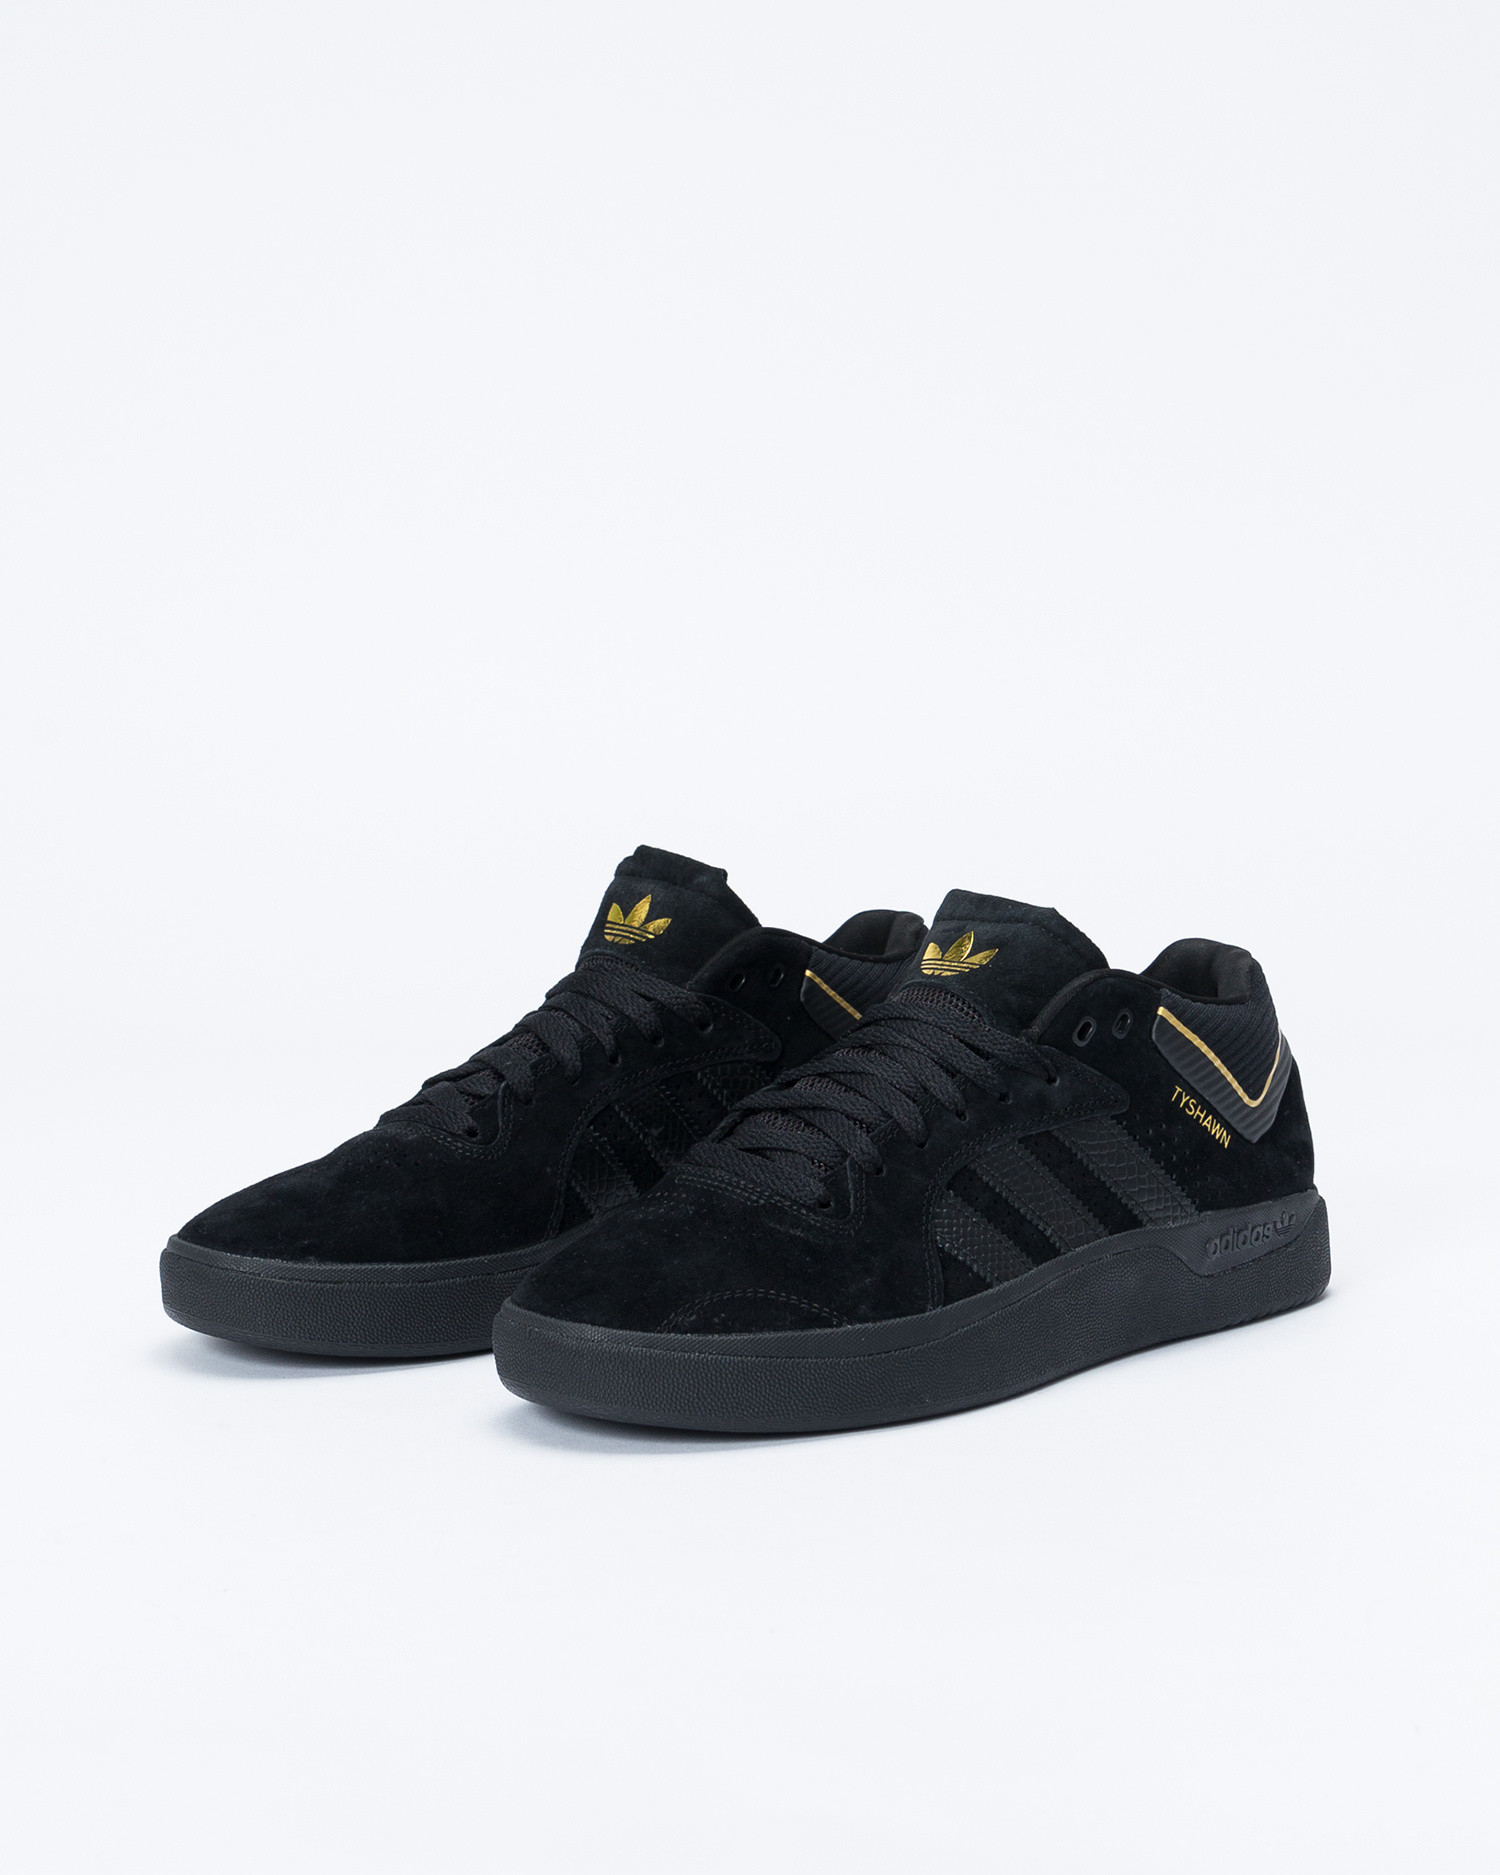 Adidas Tyshawn Core Black/Core Black/Gold Metal